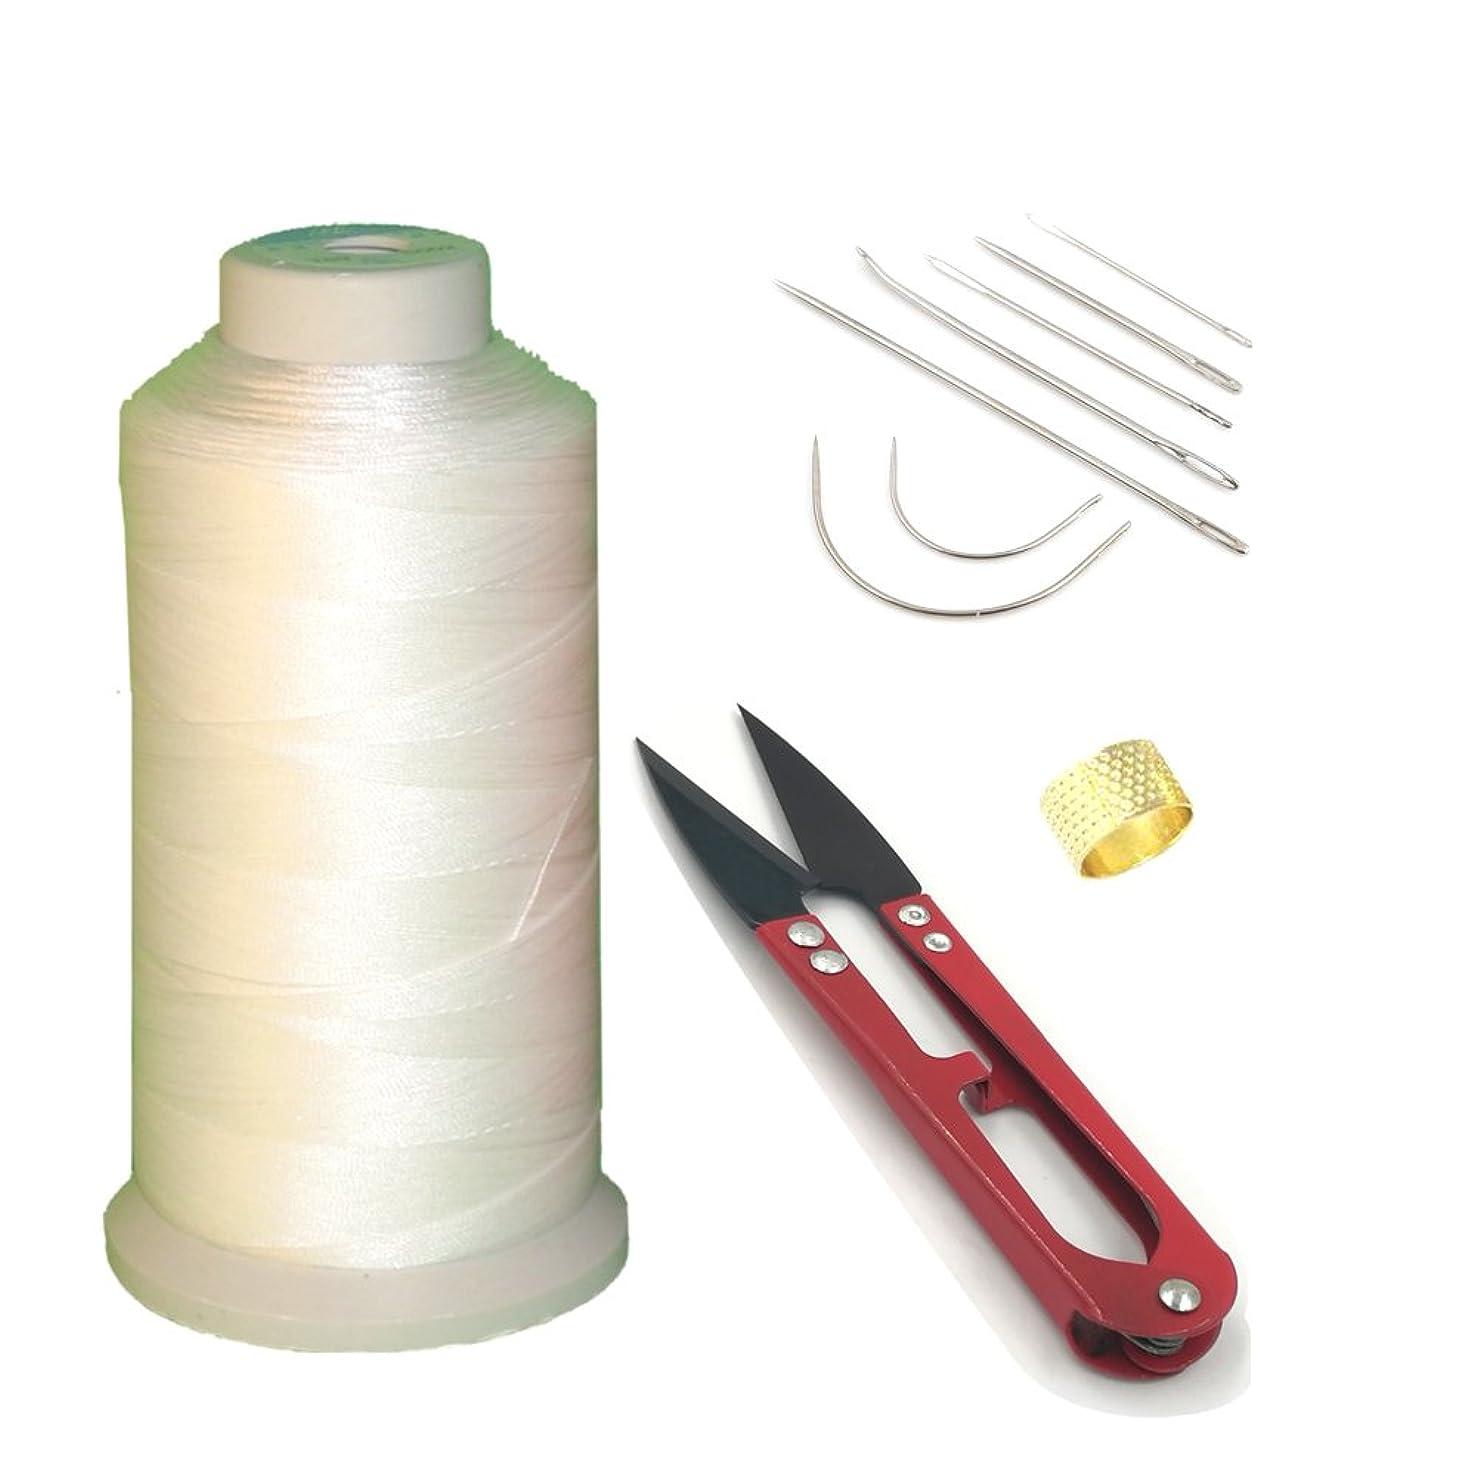 Ninetonine Bonded Nylon Sewing Thread, Curved Needles, Scissors and Thimble Tools Kits (White)